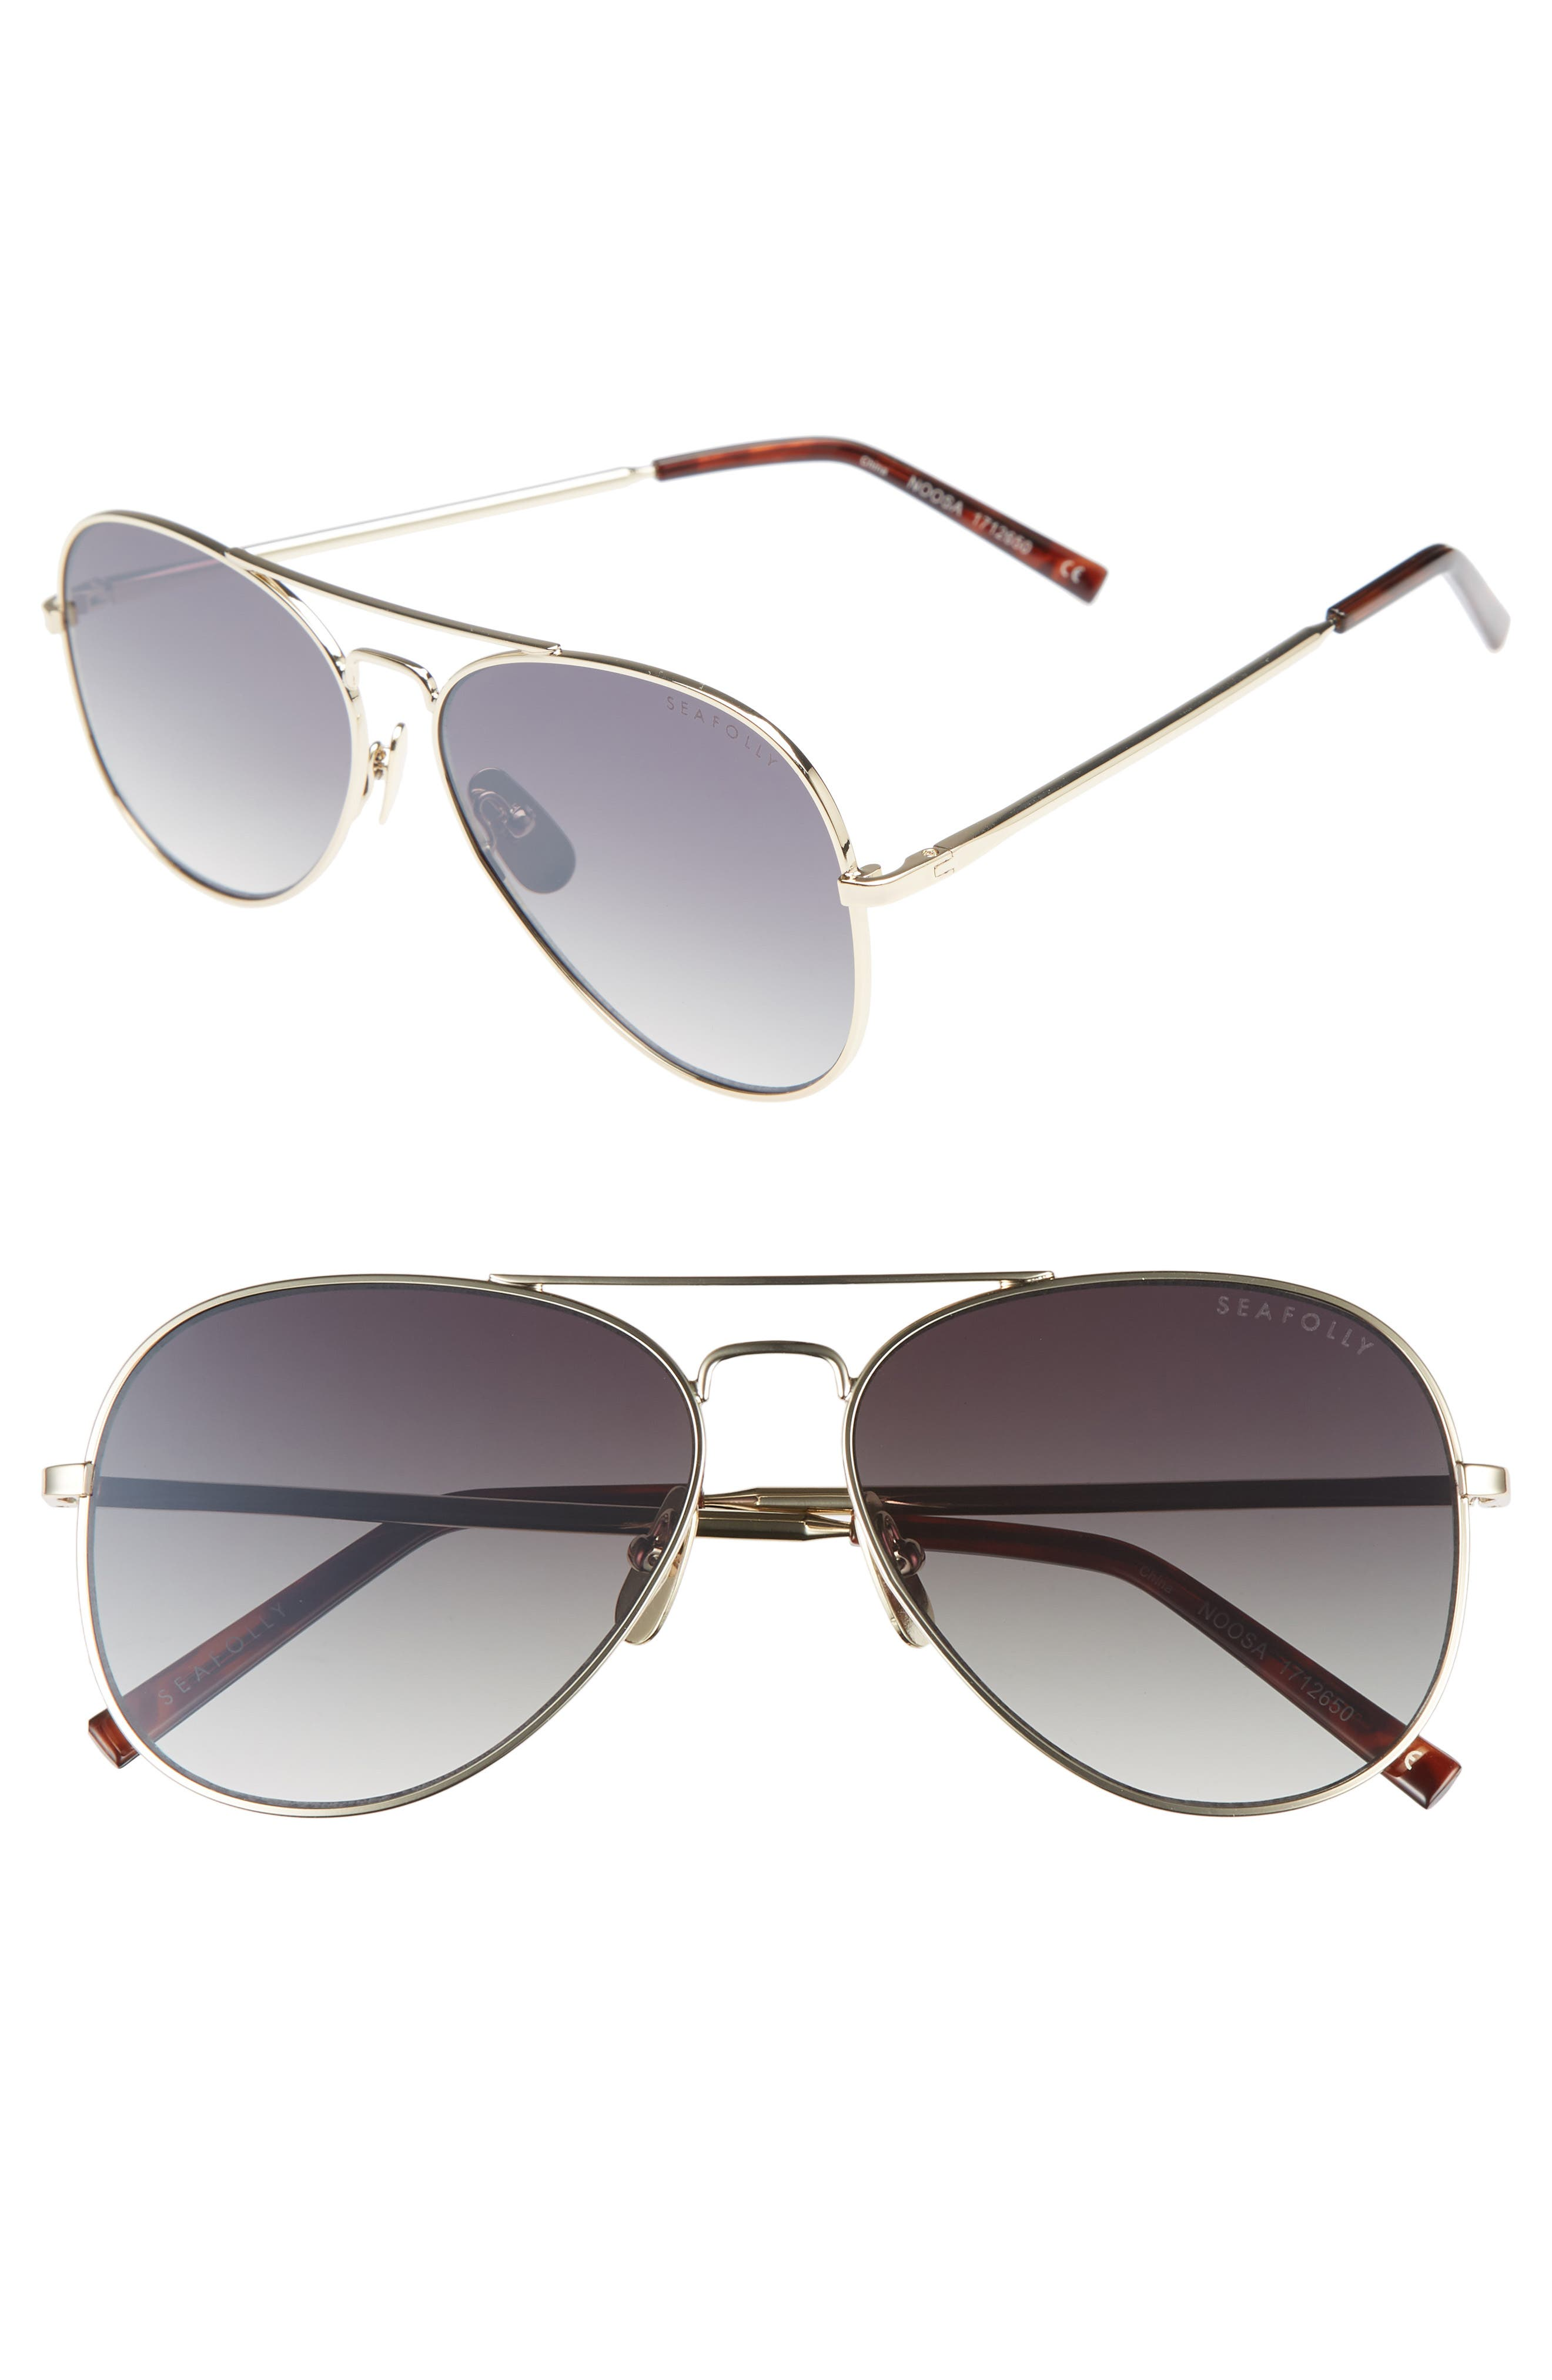 Noosa 51mm Metal Aviator Sunglasses,                             Main thumbnail 1, color,                             Gold